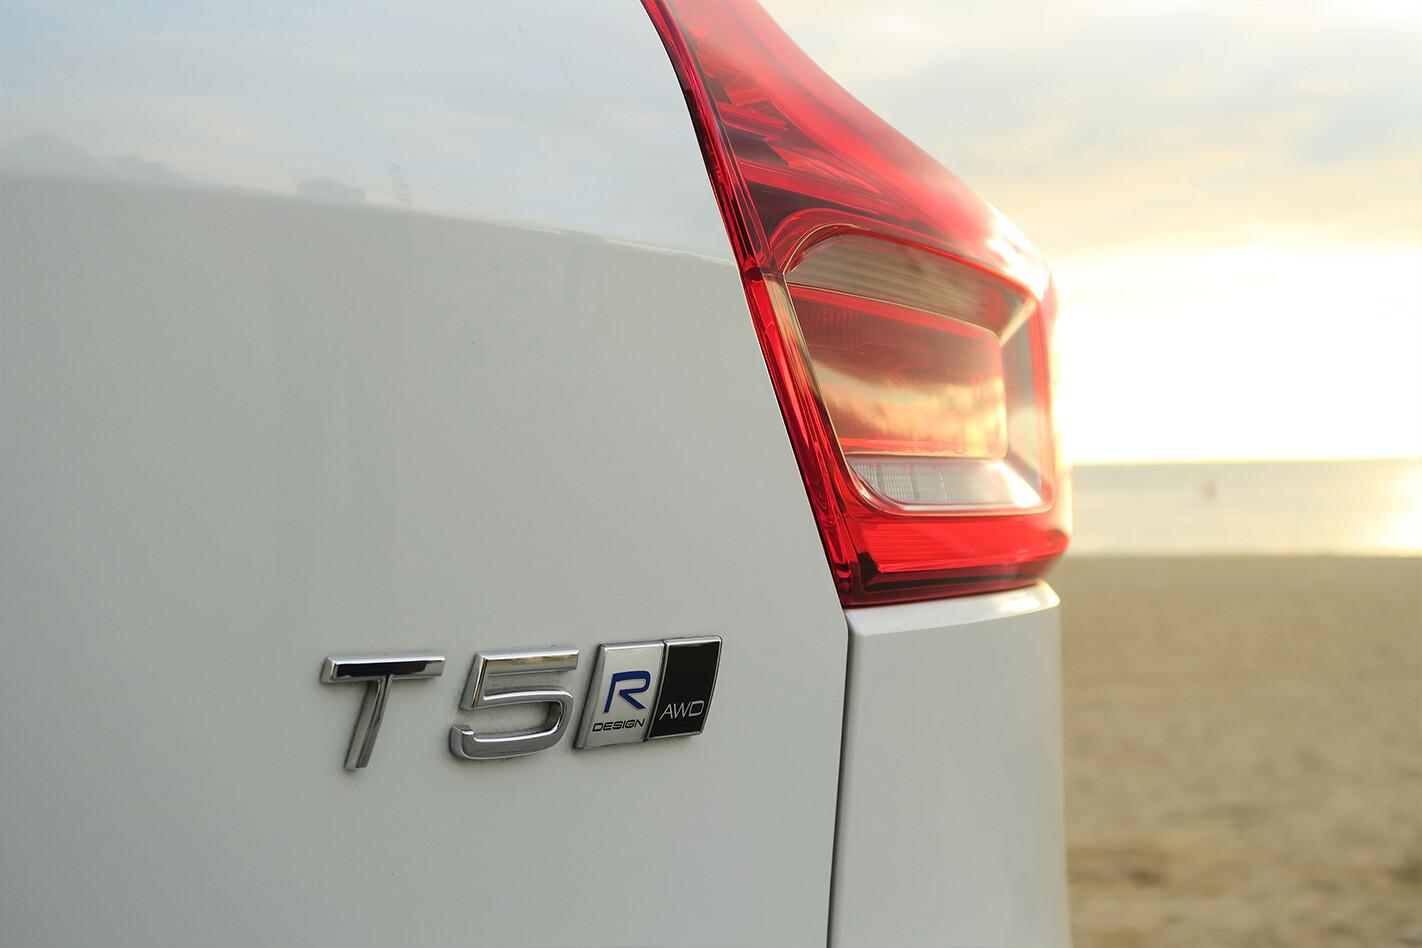 Volvo Xc 40 Rear Badge Detail Jpg